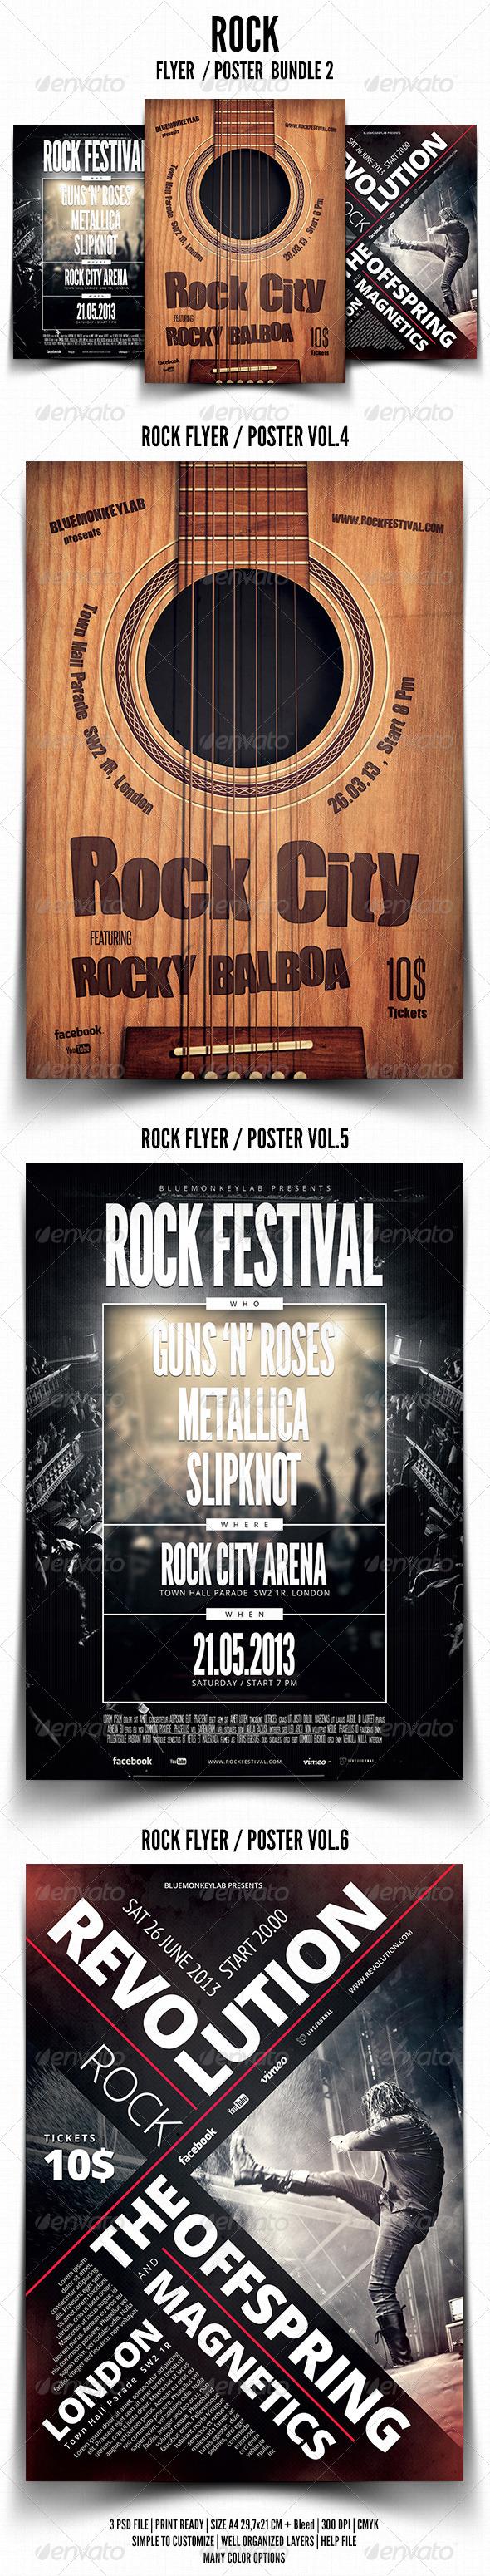 GraphicRiver Rock Flyer Poster Bundle 2 5083453